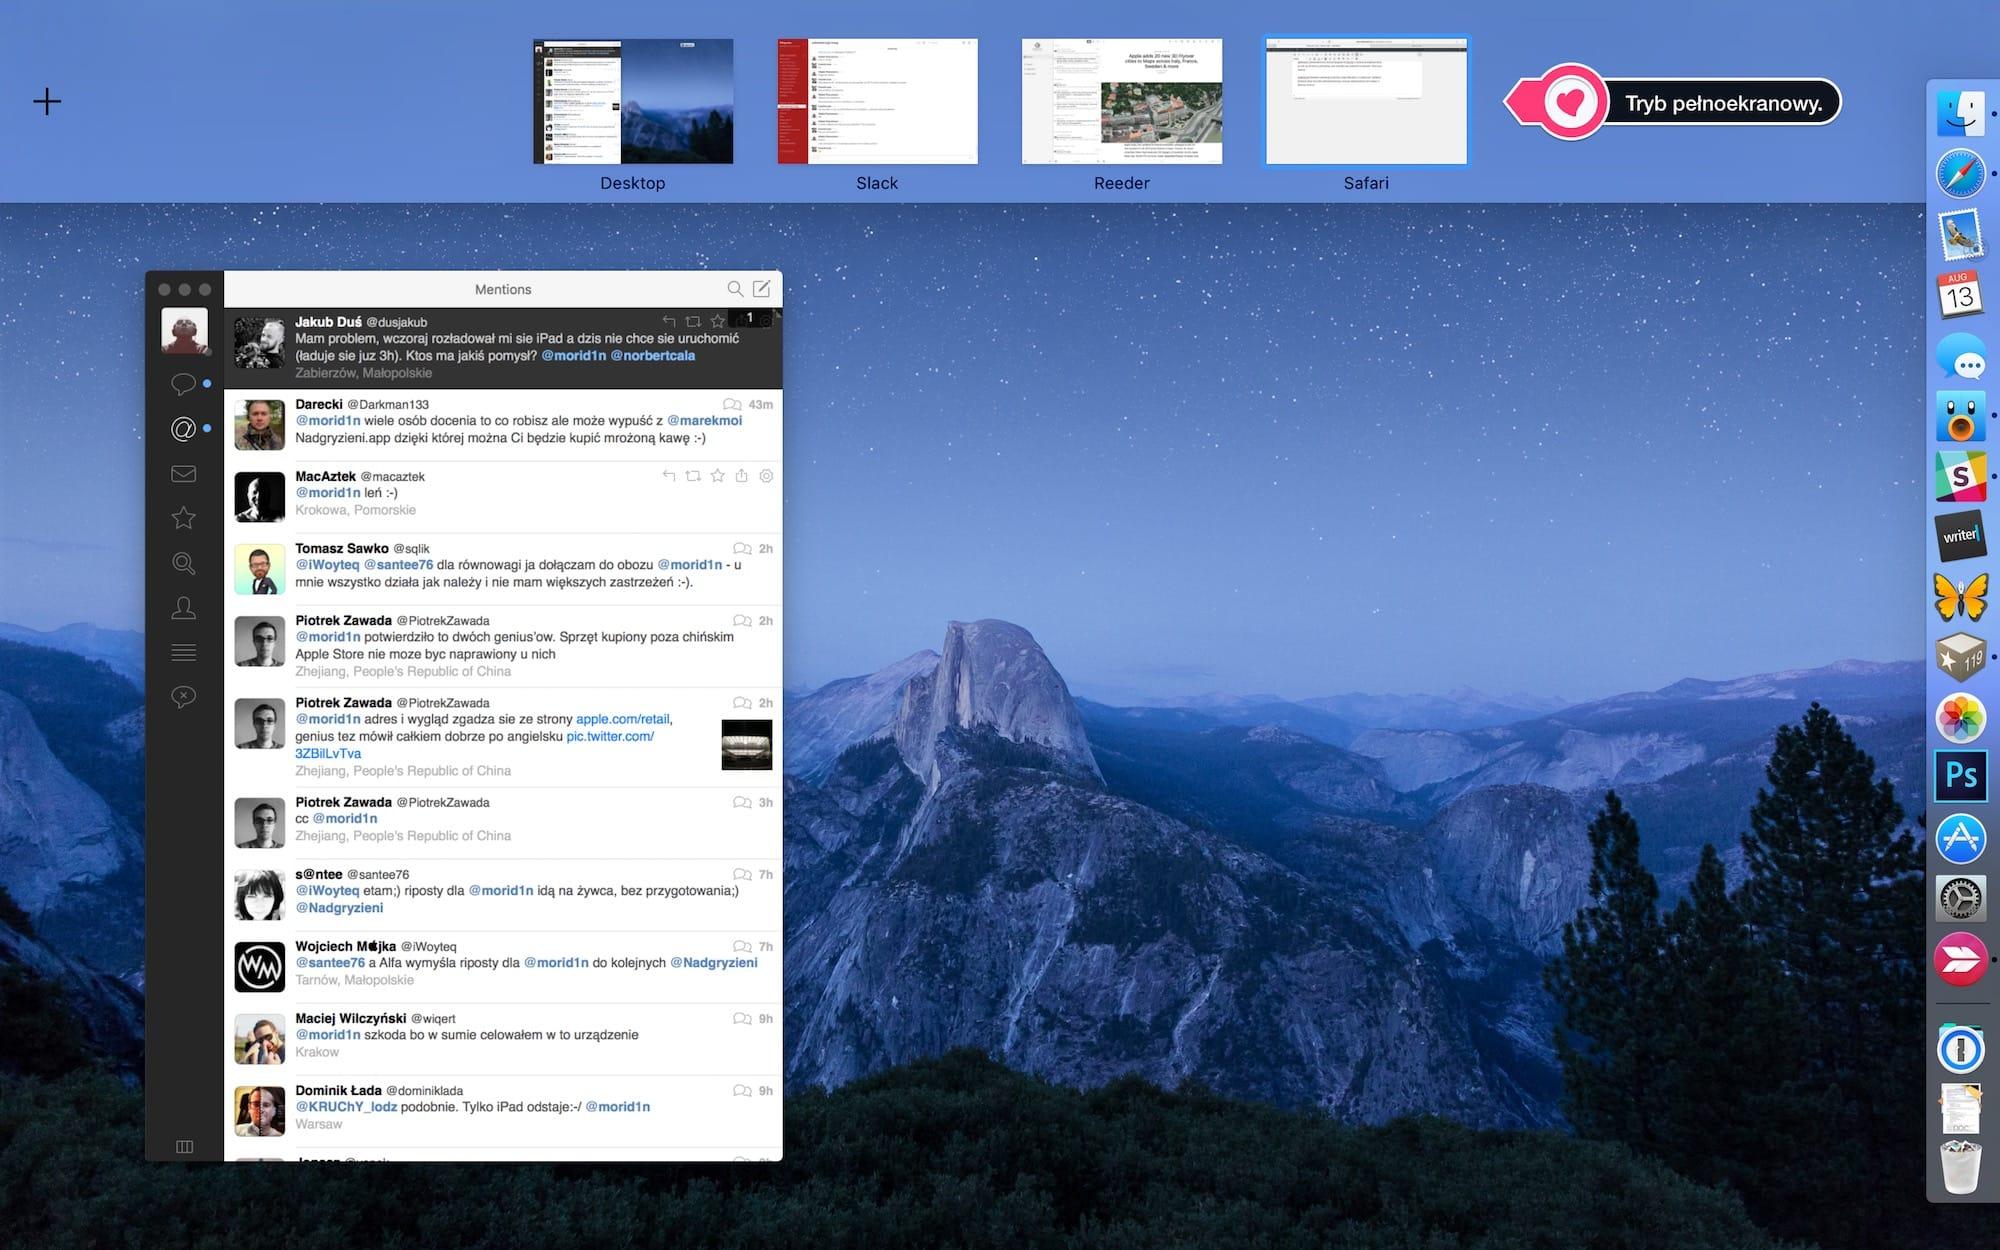 OS-X-app-fullscreen-mode-hero